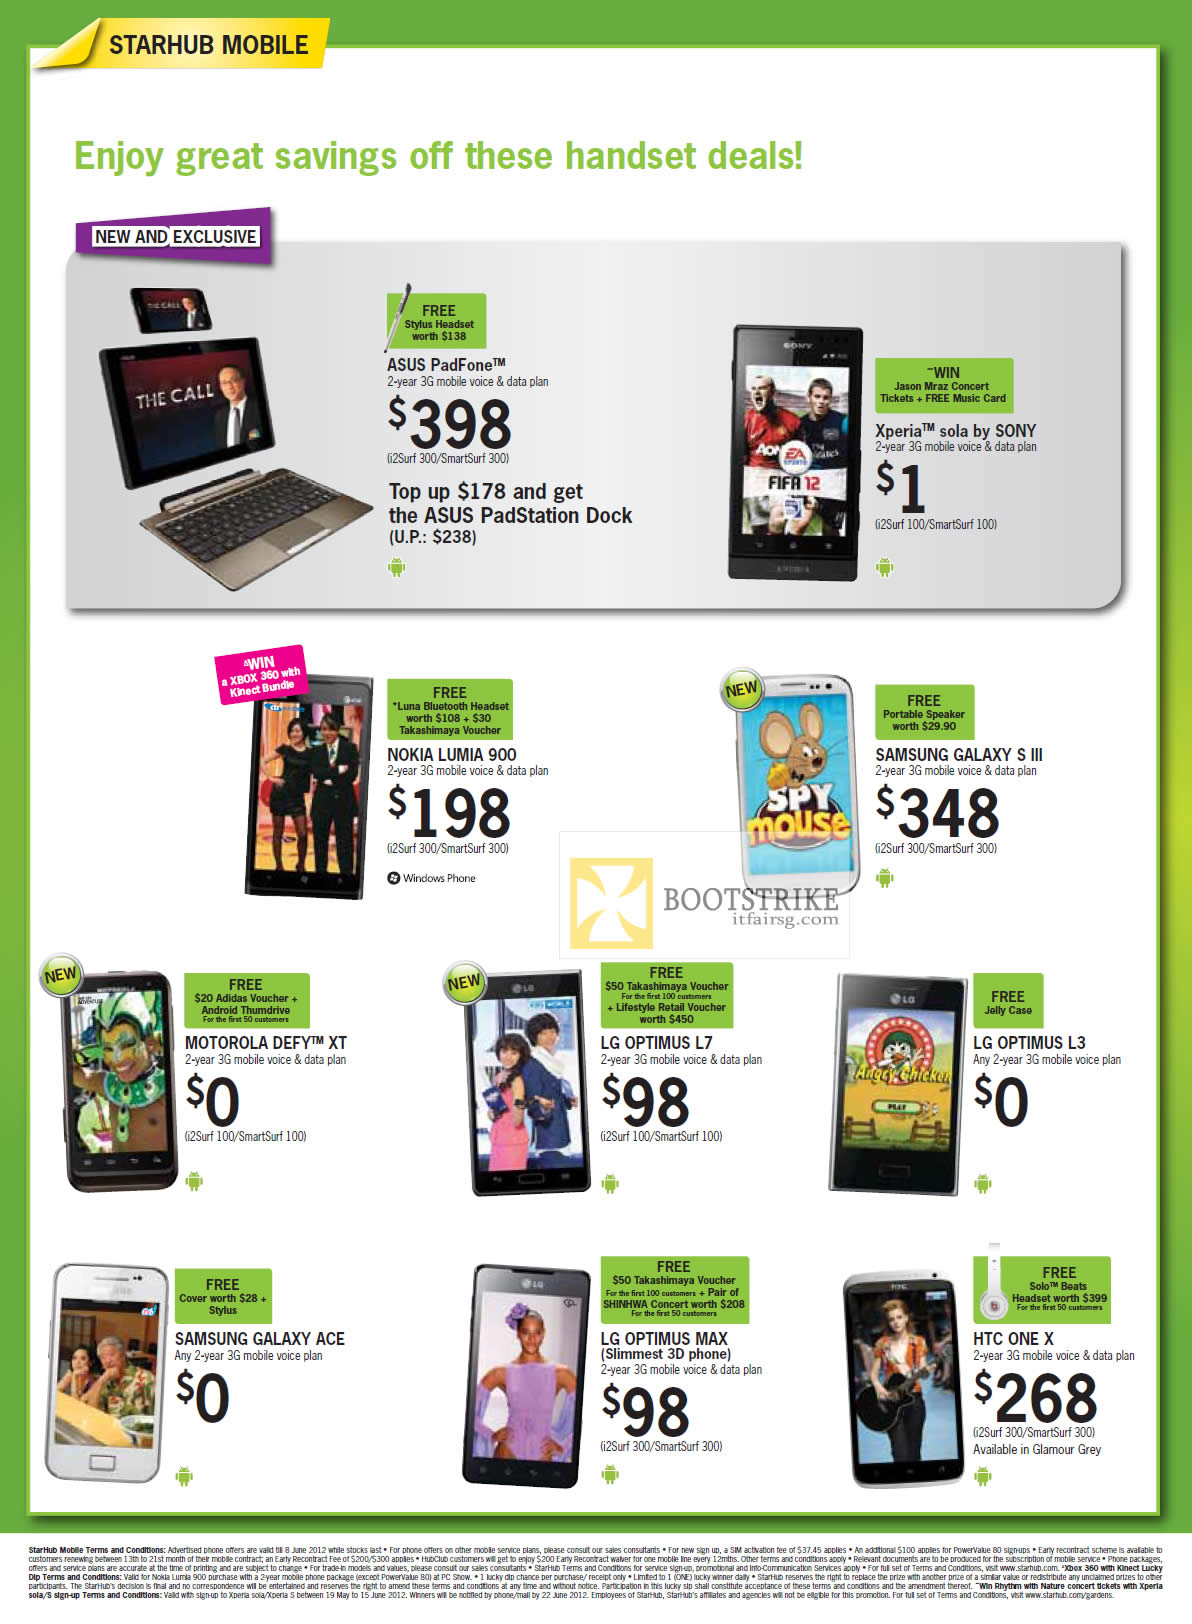 Mobile ASUS PadFone, Sony Xperia Sola, Nokia Lumia 900, Samsung Galaxy S III, Ace, Motorola Defy XT, LG Optimus L7, L3, Max, HTC One X